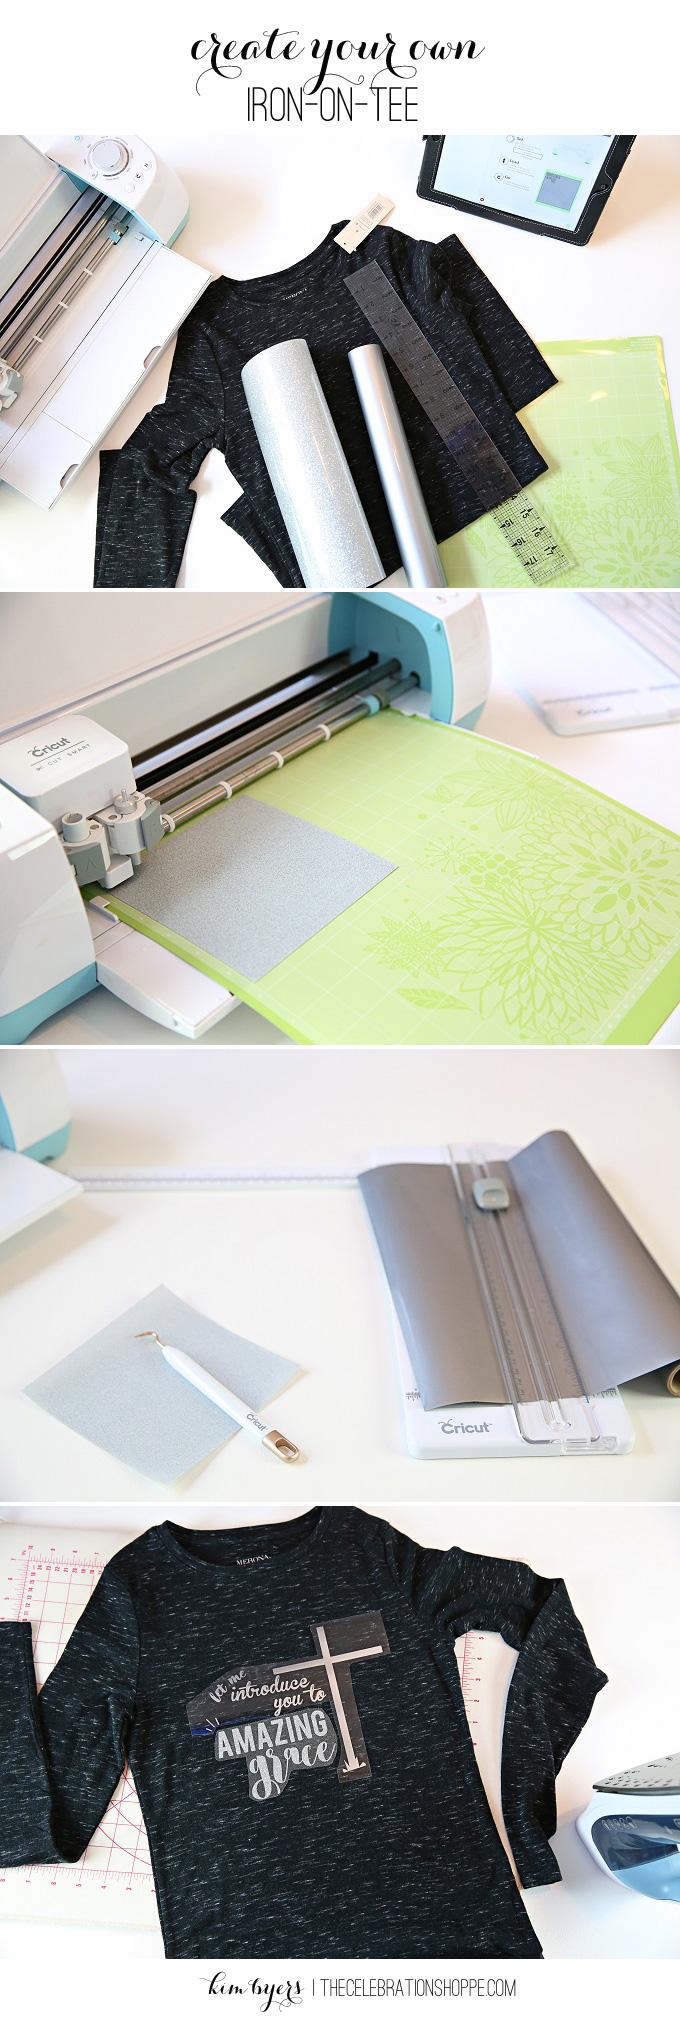 Make An Amazing Grace Graphic TShirt | Kim Byers